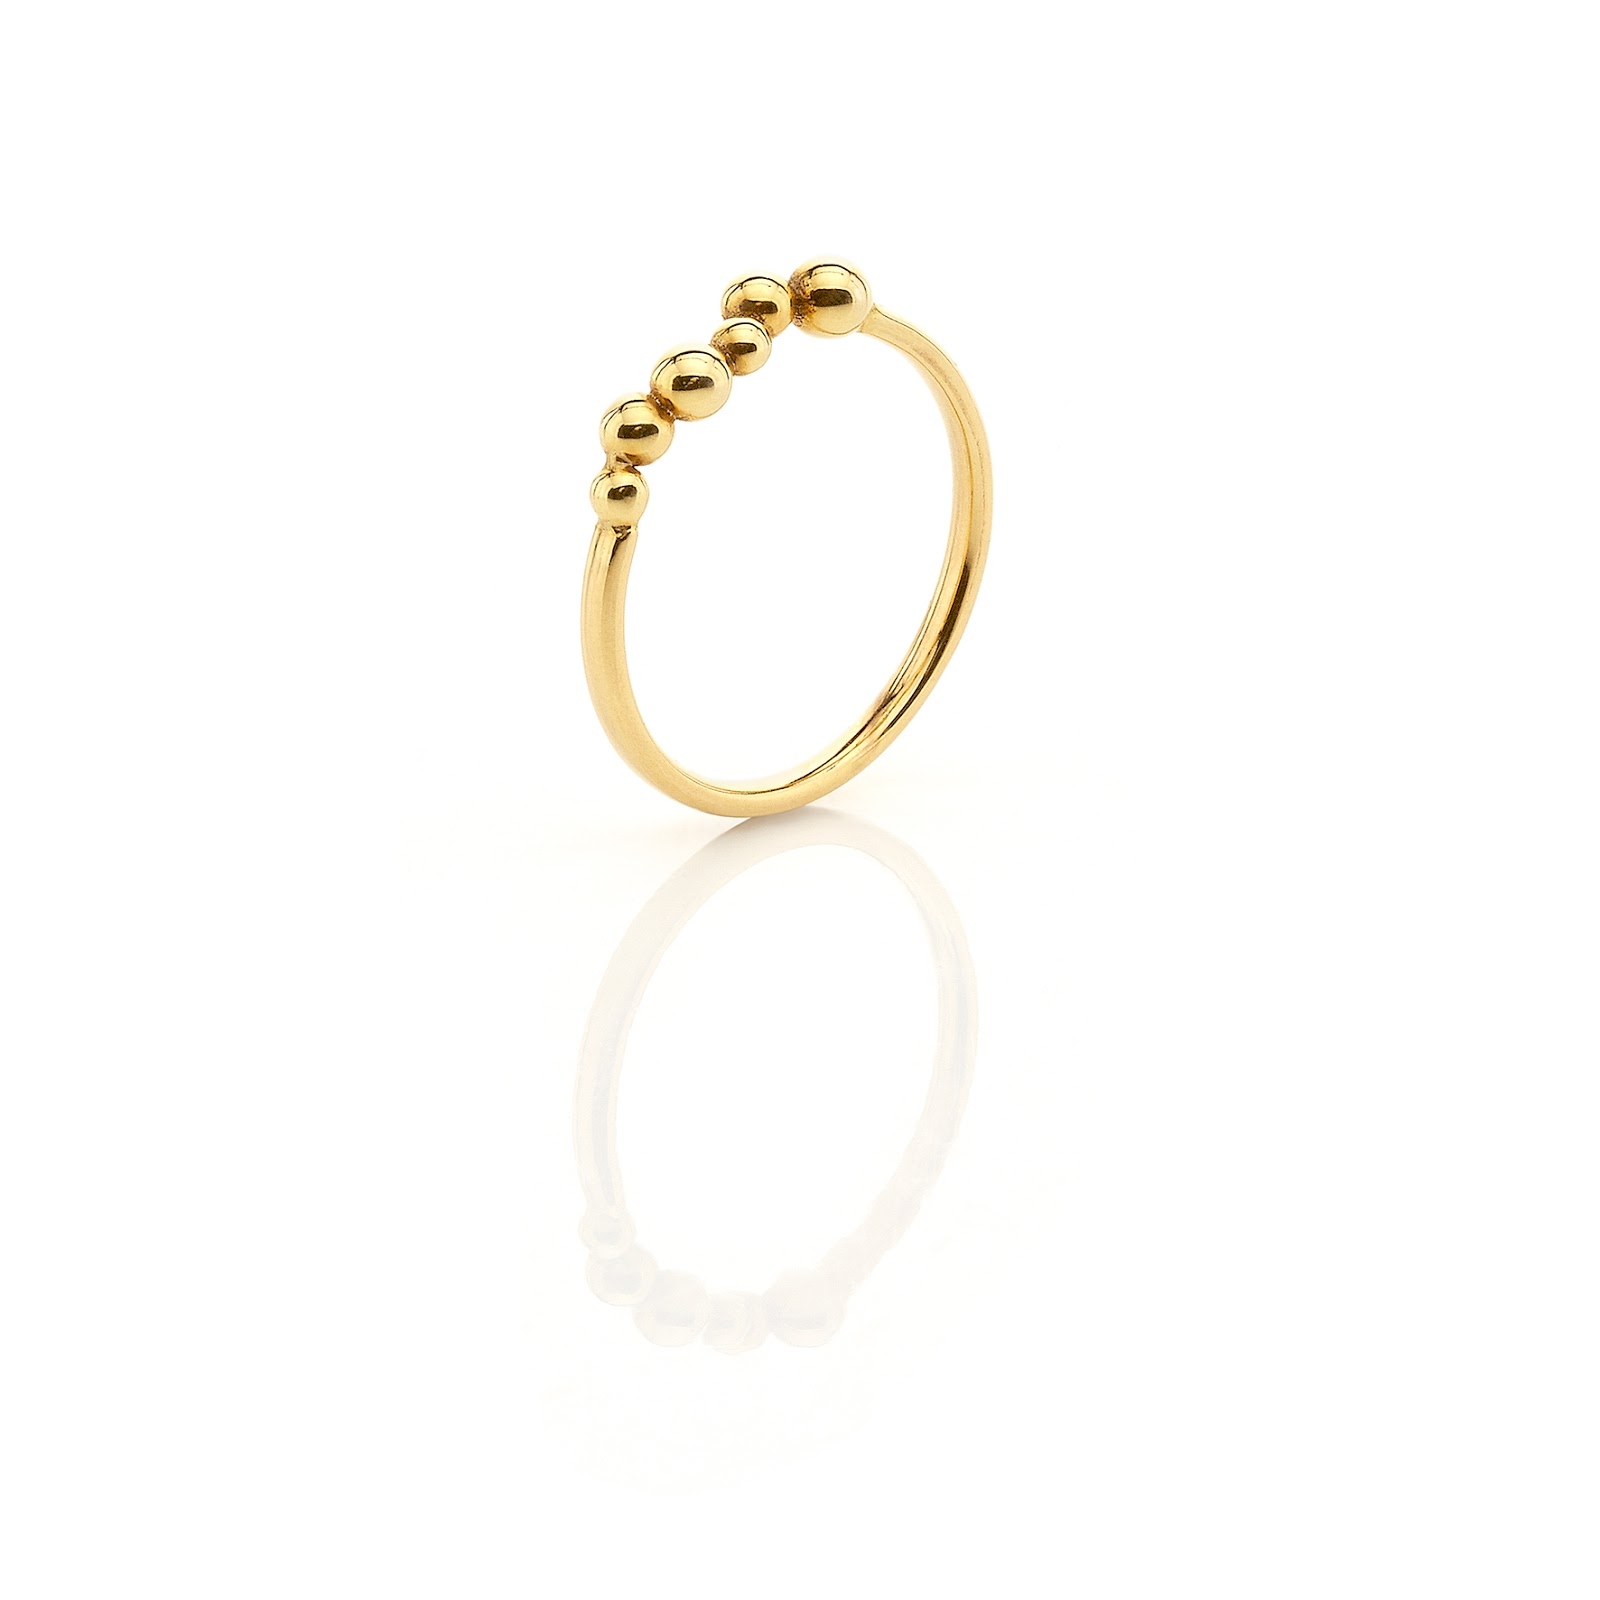 speira, speira jewellery, minimal jewellery online, uk jewellery shop